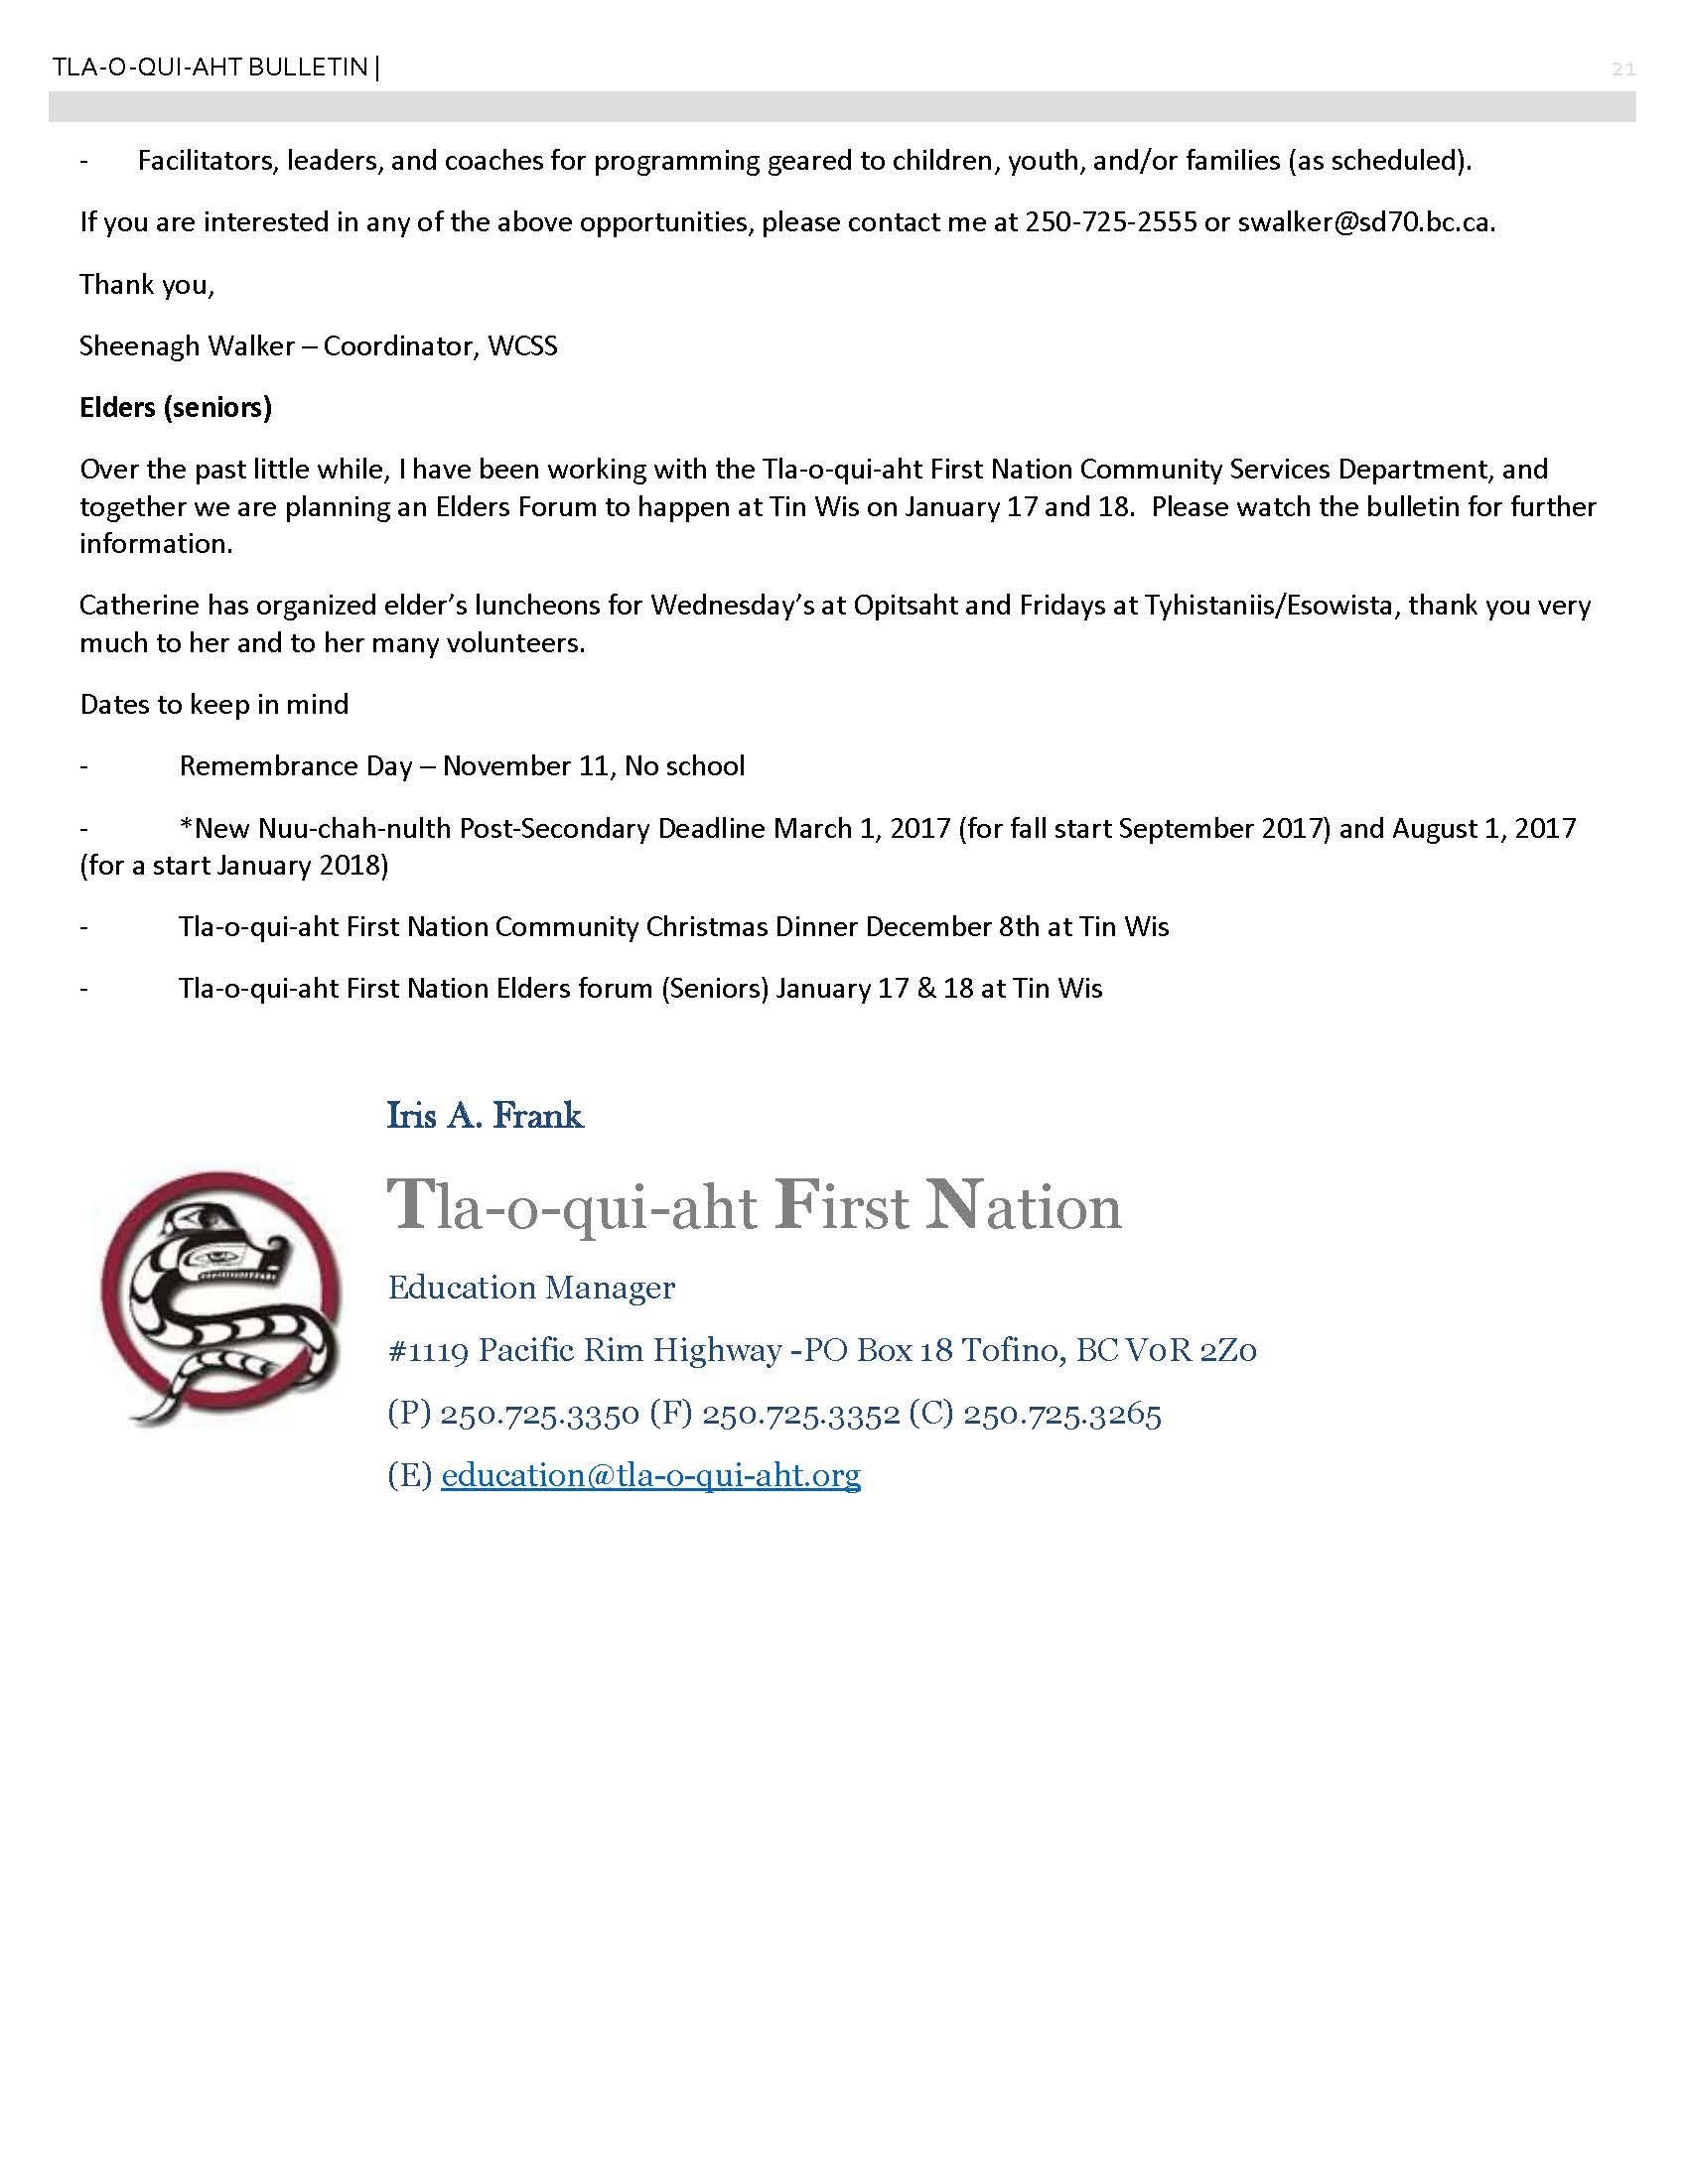 TFN Bulletin Nov 1st 2016_Page_21.jpg